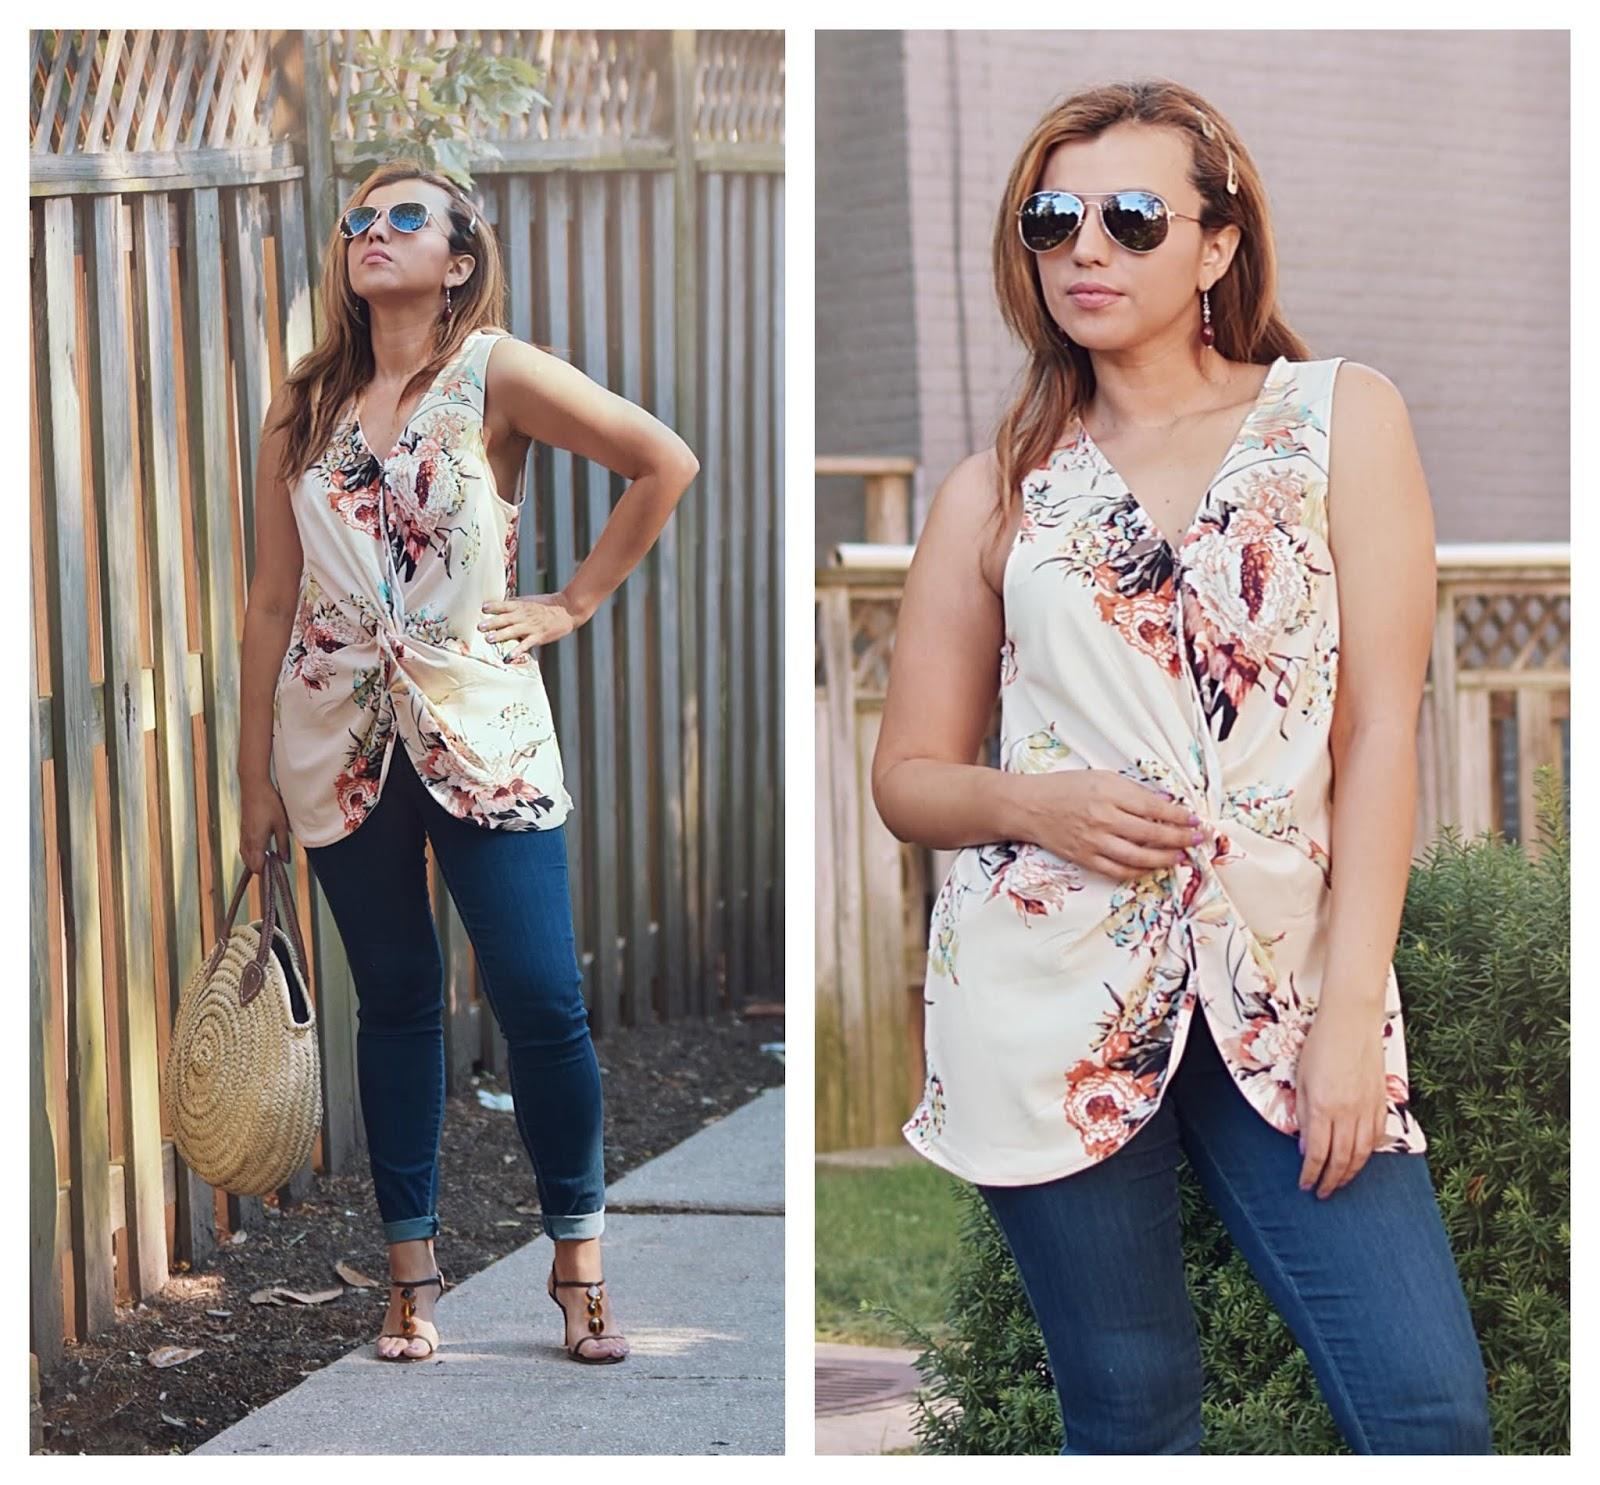 Twist-Front Sleeveless Floral Top-MariEstilo-lookbookstore-dcblogger-modaelsalvador-fashionblog-armandhugon-